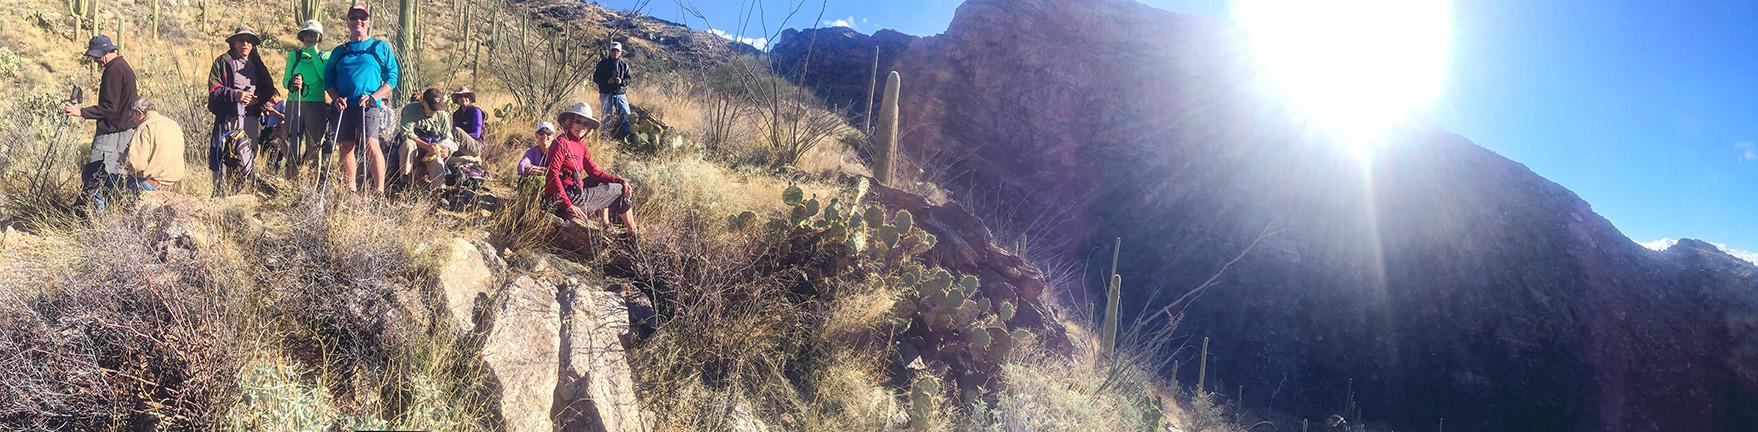 pontatoc-trail-panorama-ii-1-blog